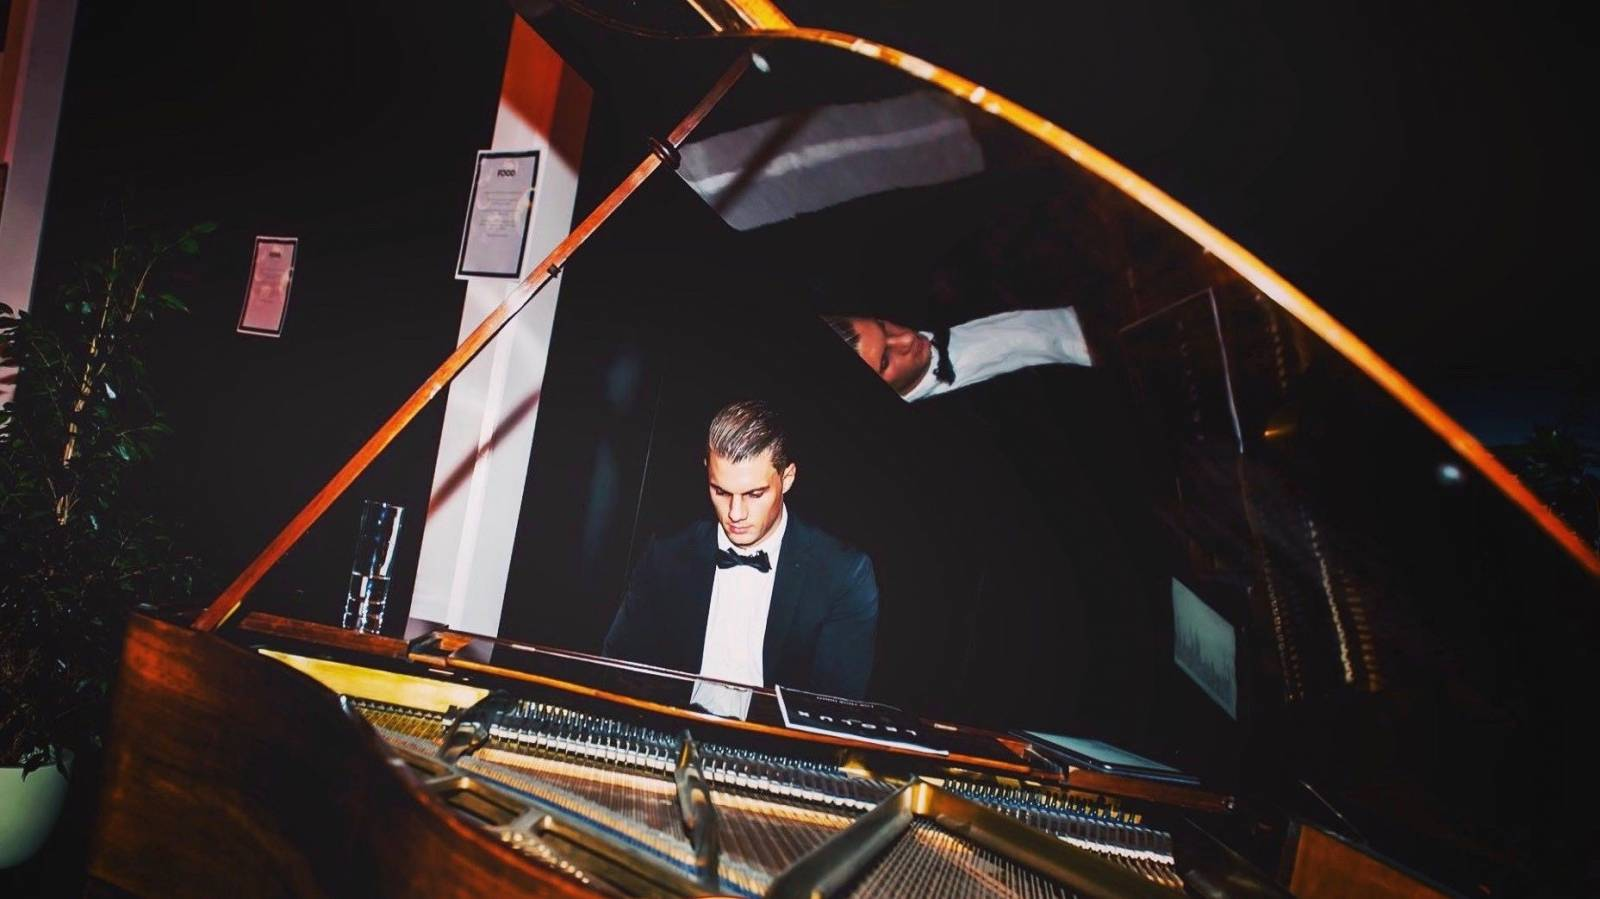 Hofnar - Licht & Geluid - Audiovisuele Diensten - DJ - Artiesten - House of Weddings - House of Events - 7